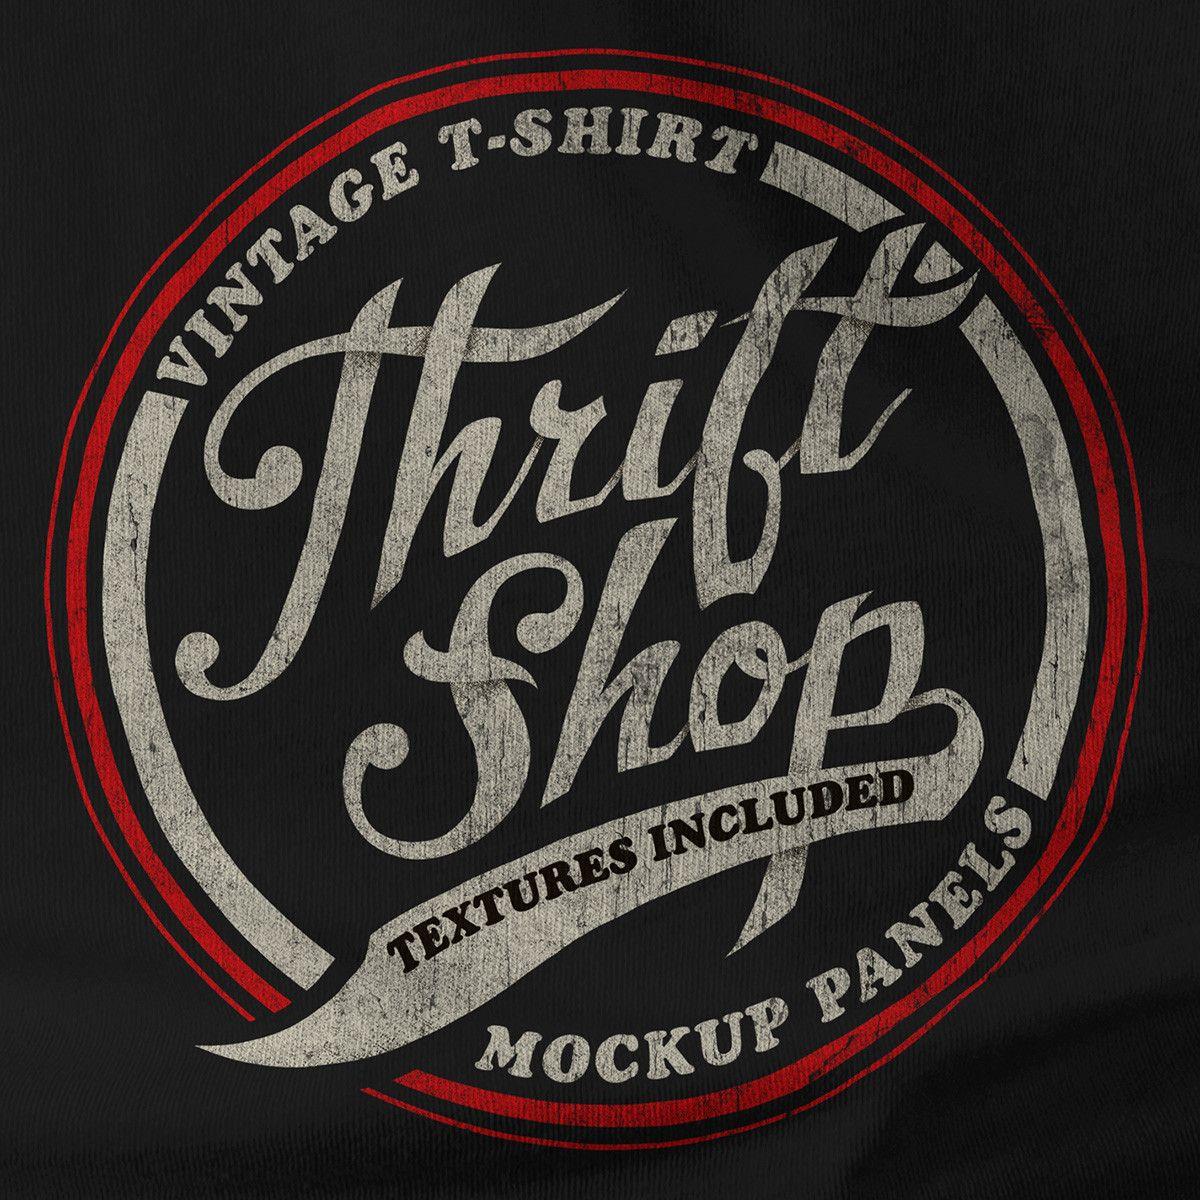 Thrift Shop Vintage T Shirt Texture Template Vintage Tshirts Typographic Logo Tshirt Design Inspiration